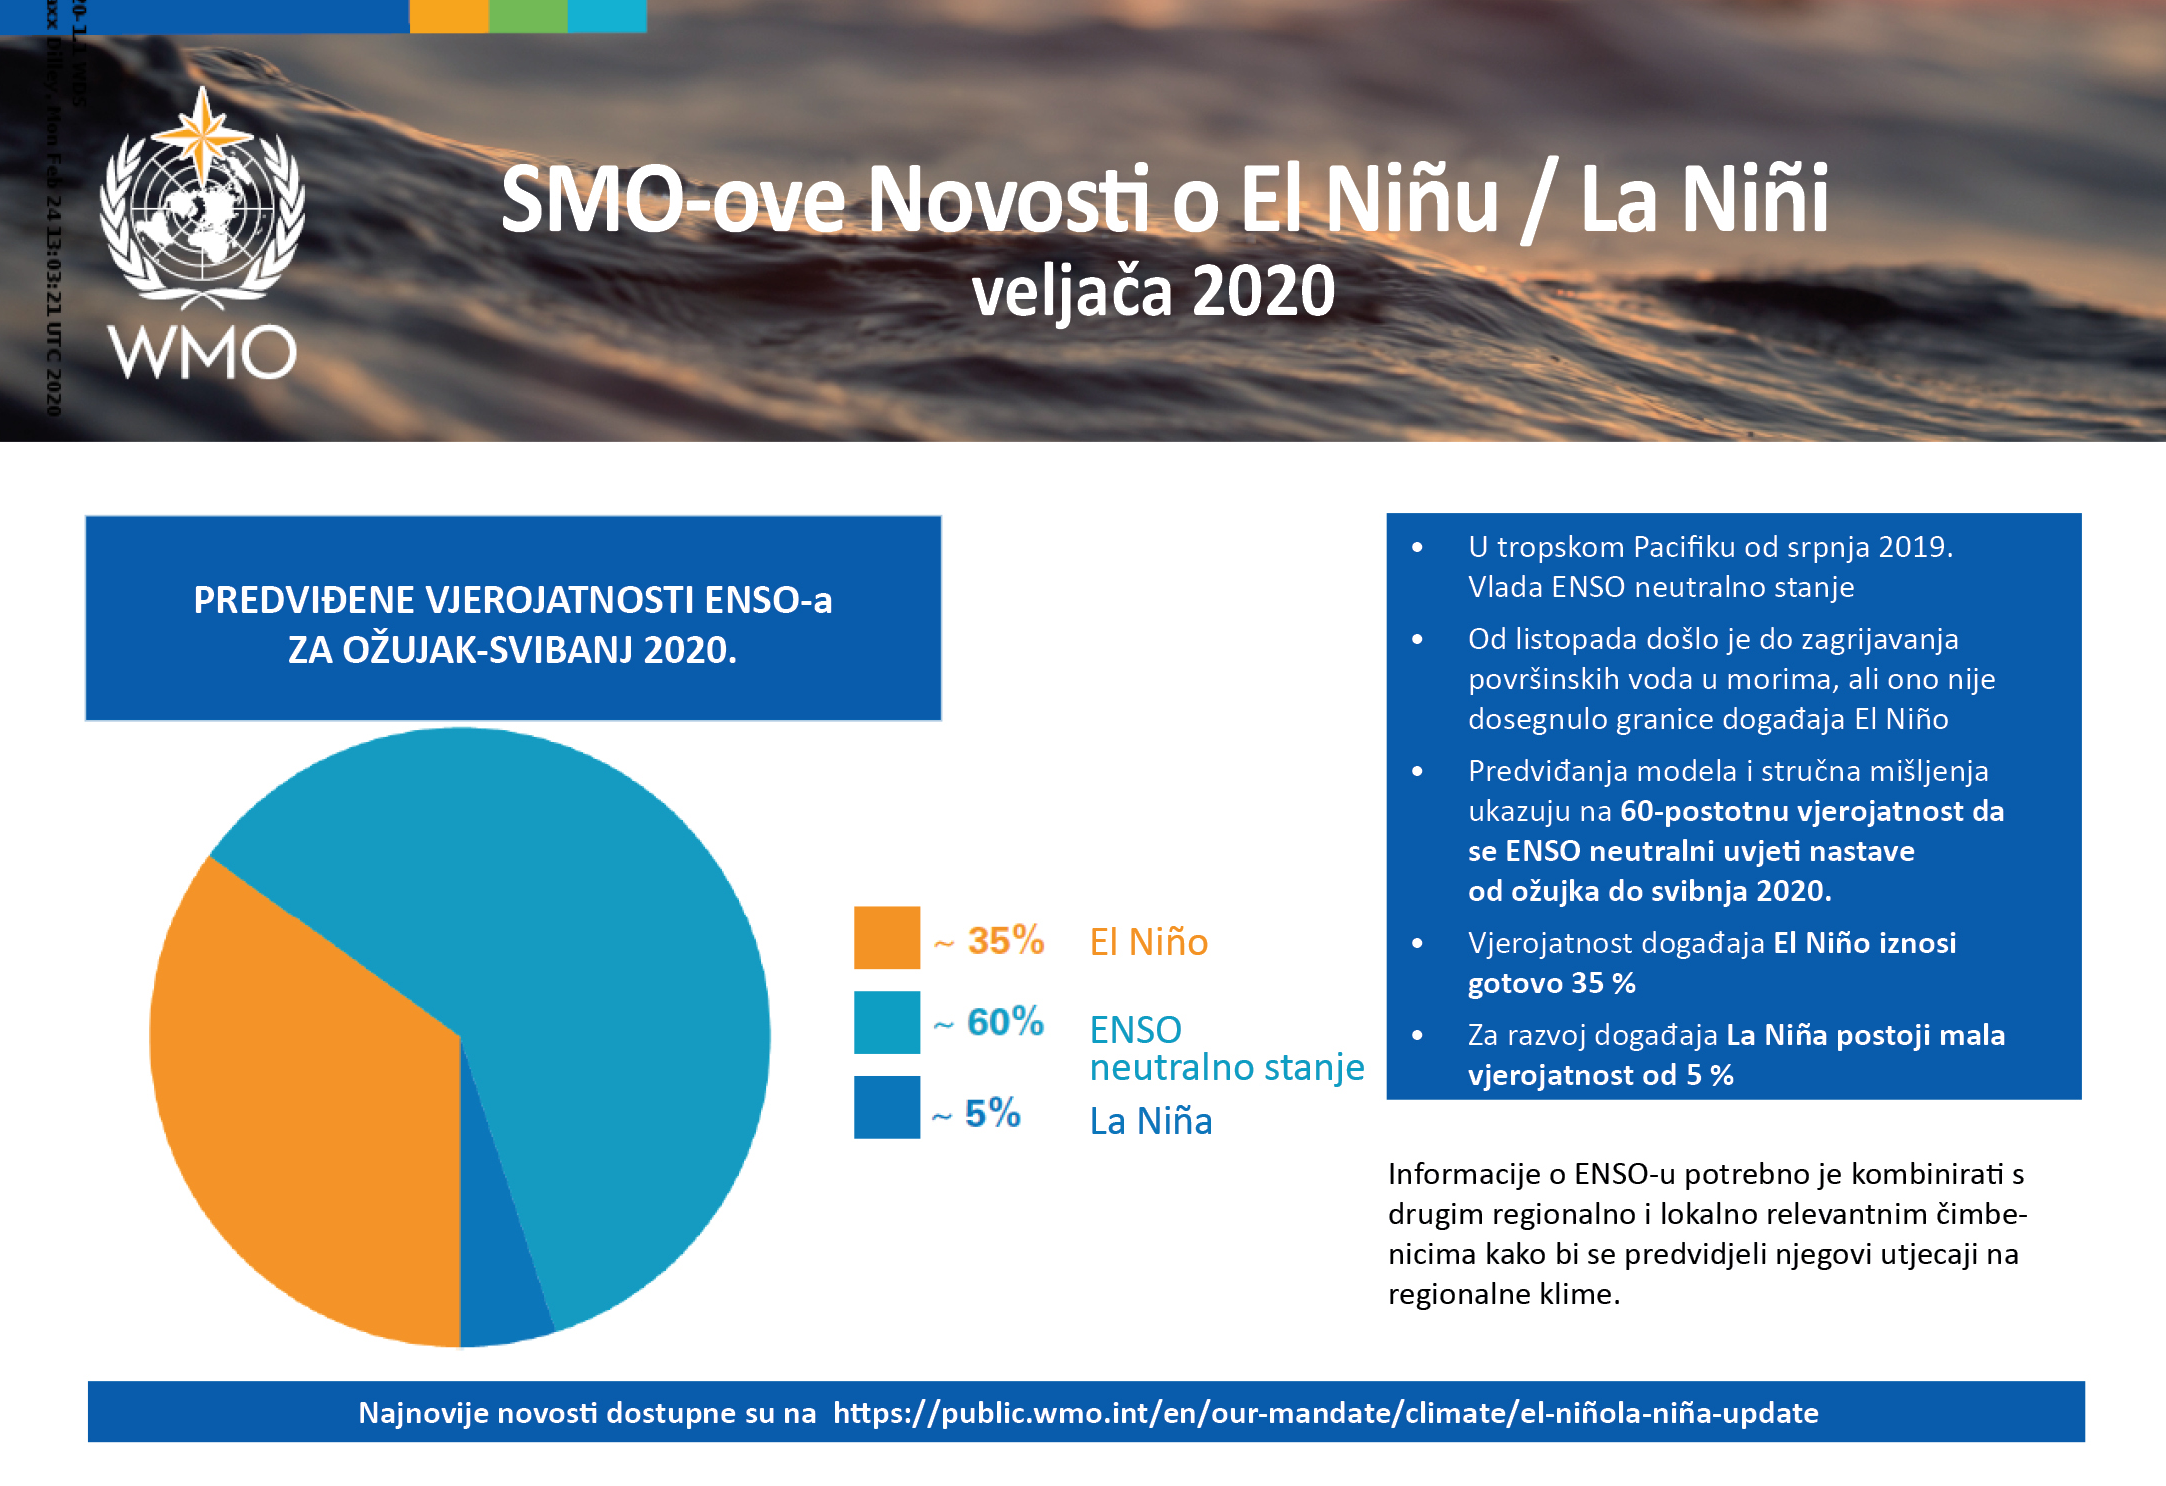 WMO novosti o El Ninu i La Nini